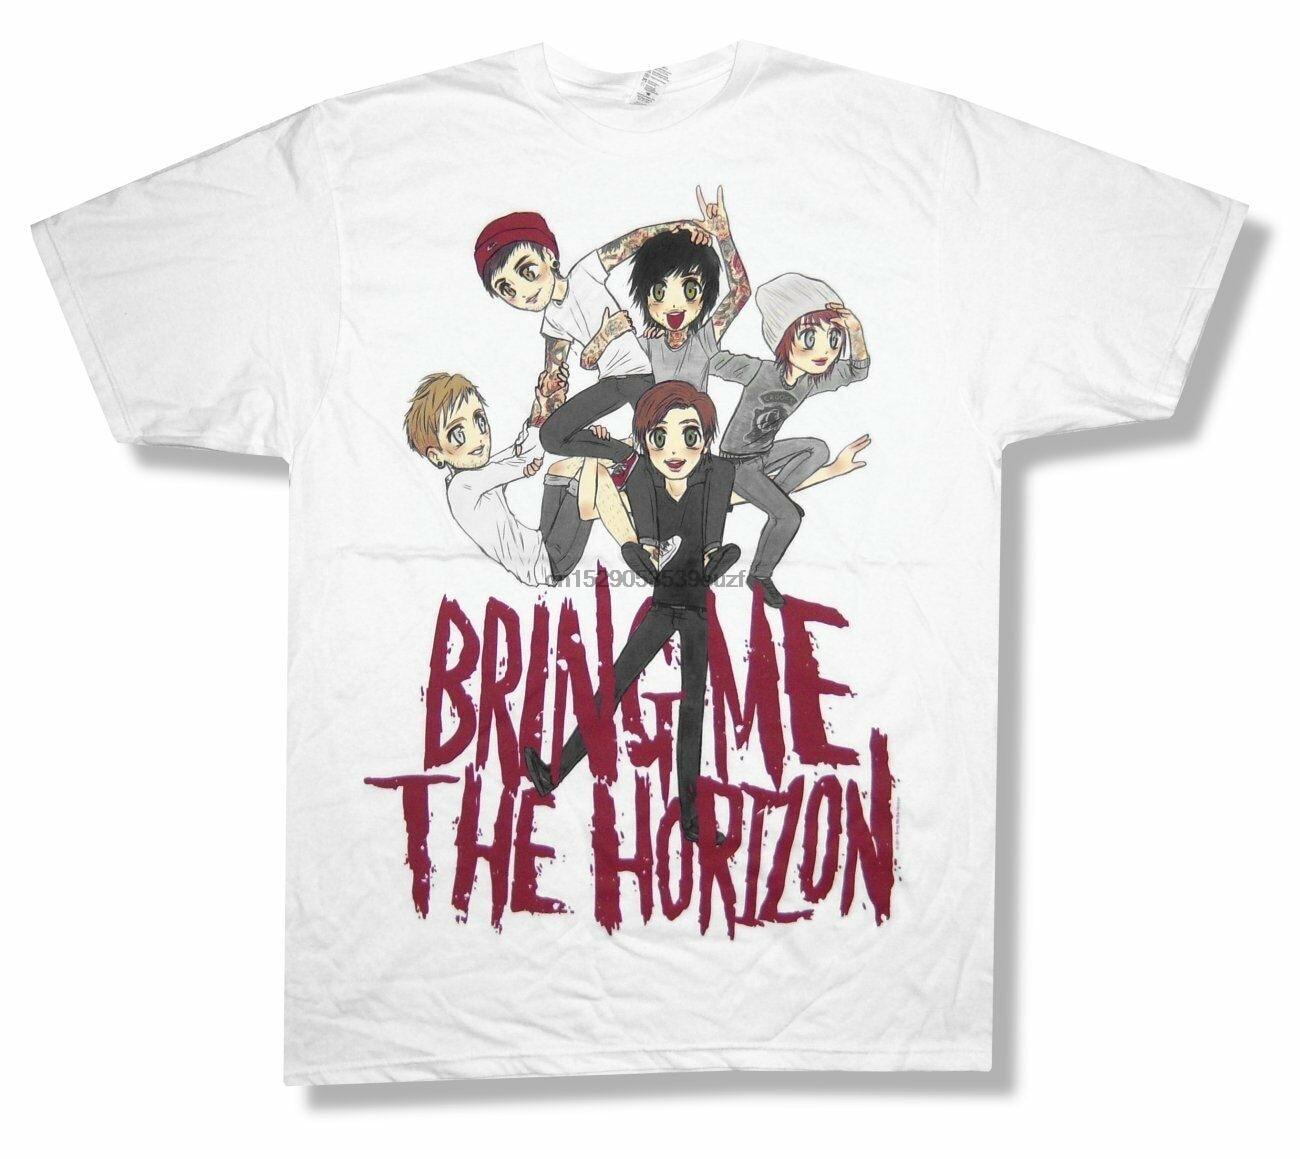 Bring Me The Horizon Sketch pila caricaturas animé camiseta nuevo adulto Xl